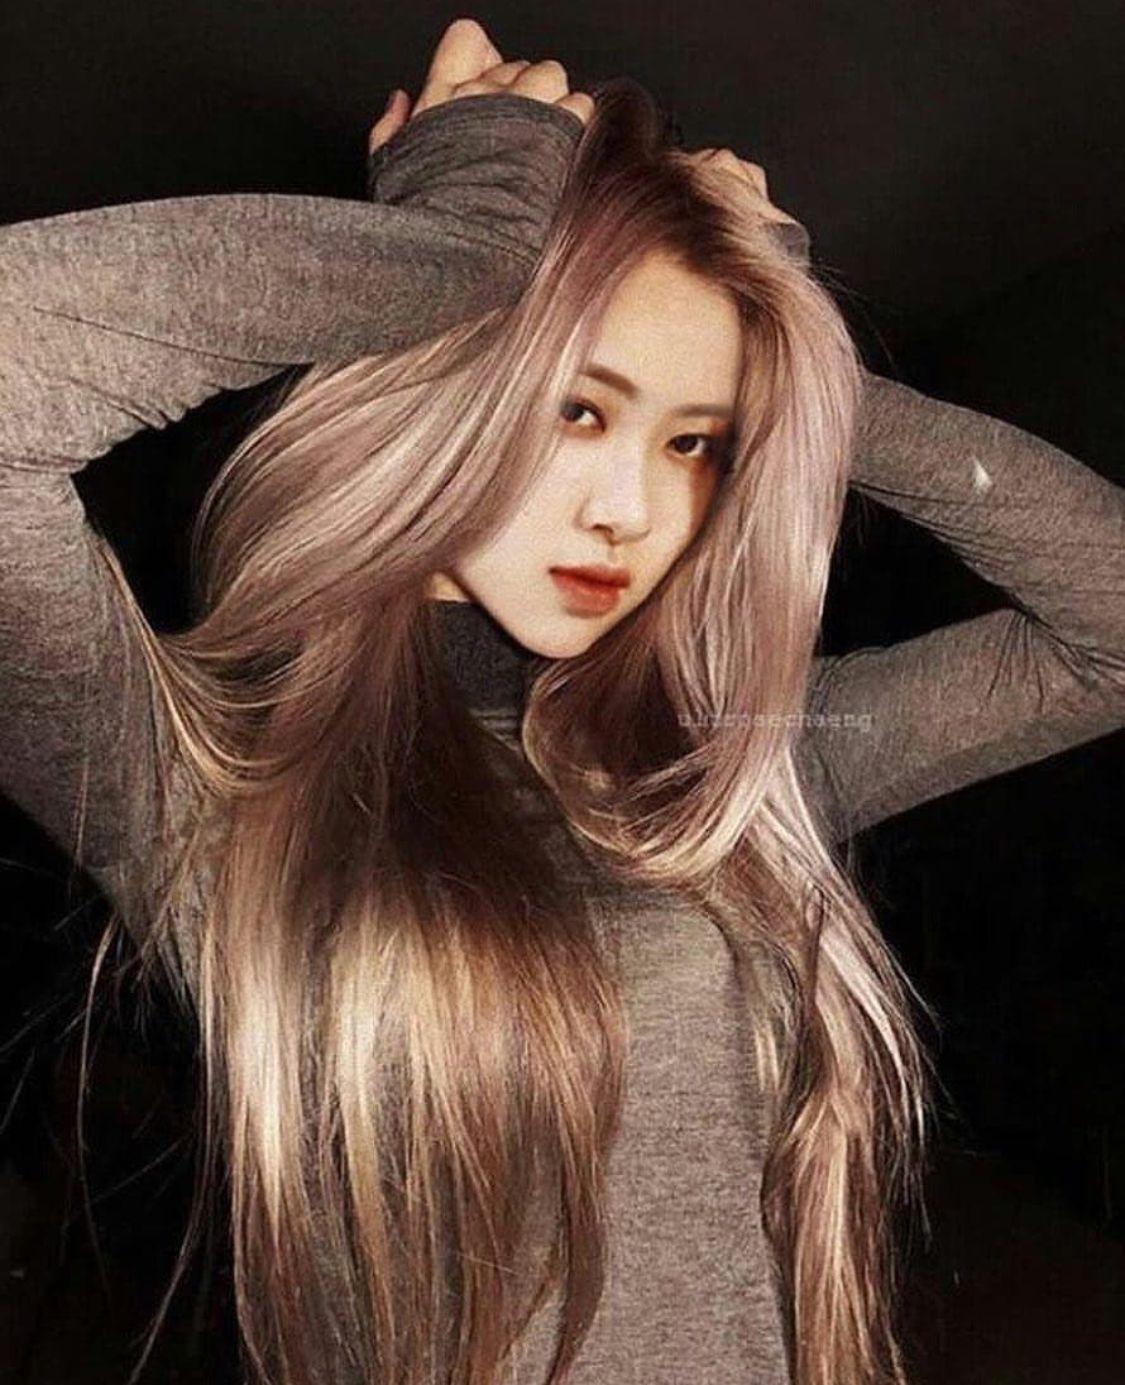 Instagram Rosekook Taelice Jinsoo Jenmin Blackpink Rose Black Pink Kpop Blackpink Fashion